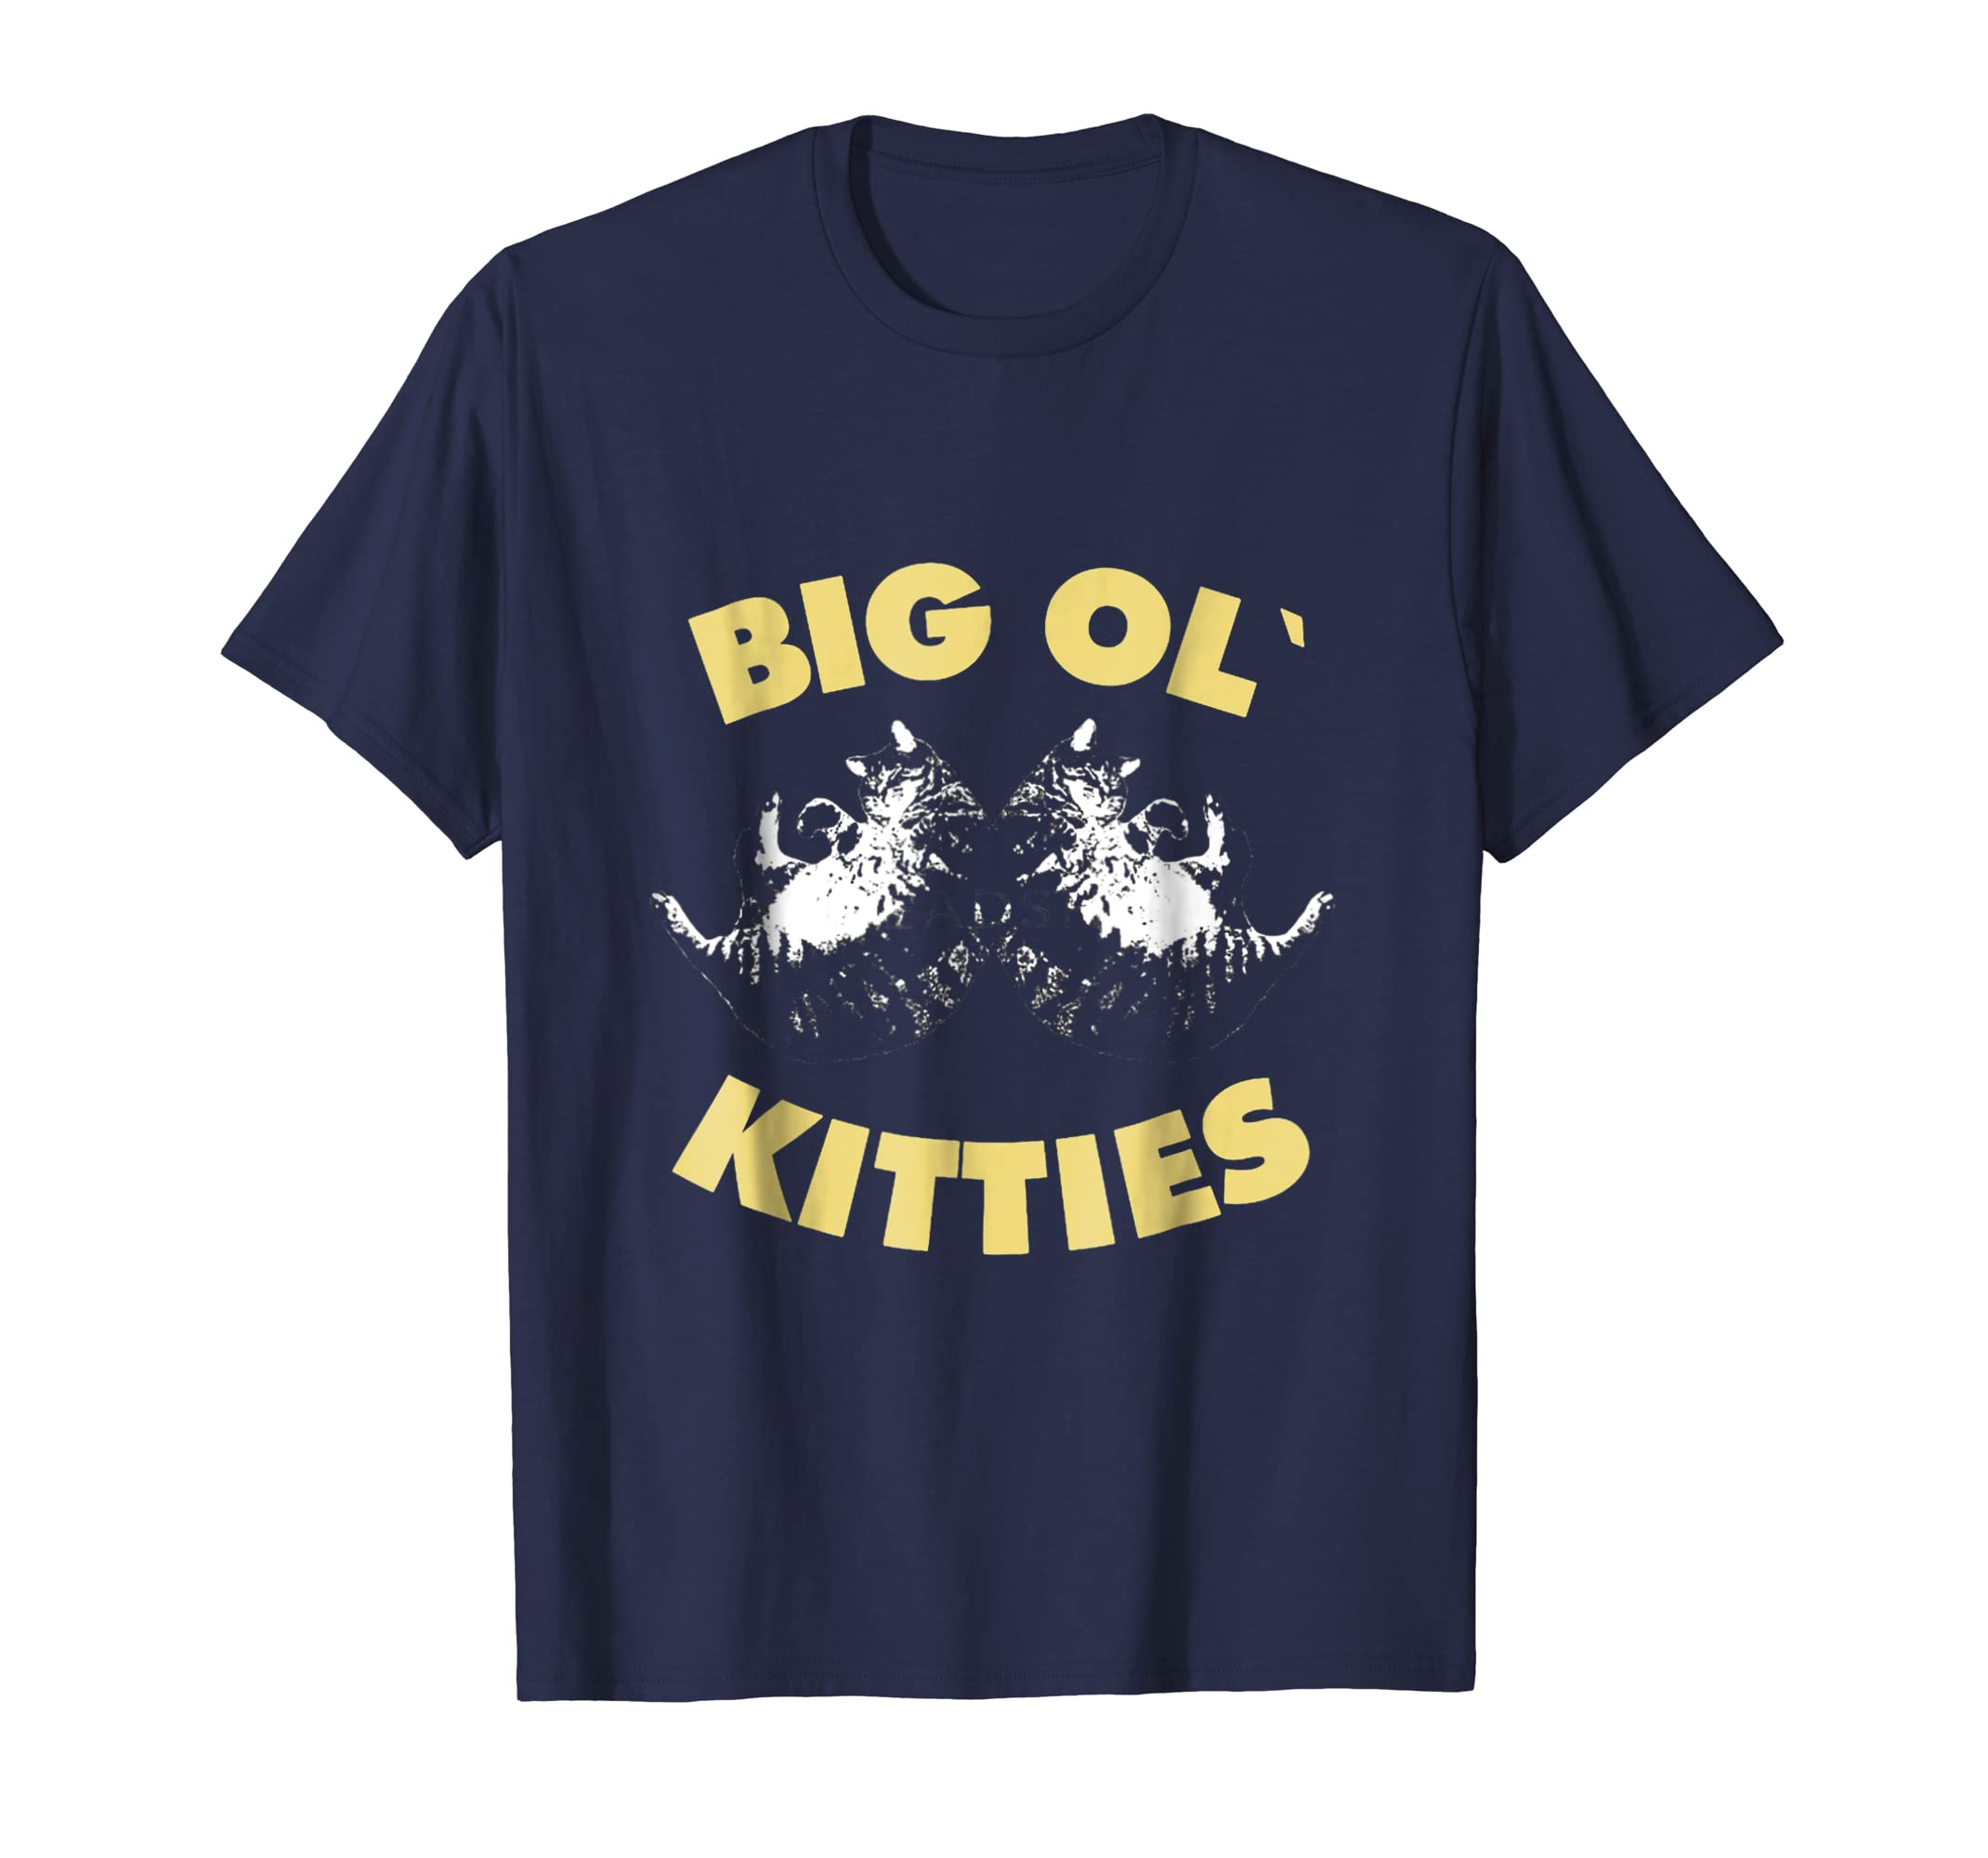 Big ol Kitties Shirt Funny Cat Lover T Shirt-Teechatpro